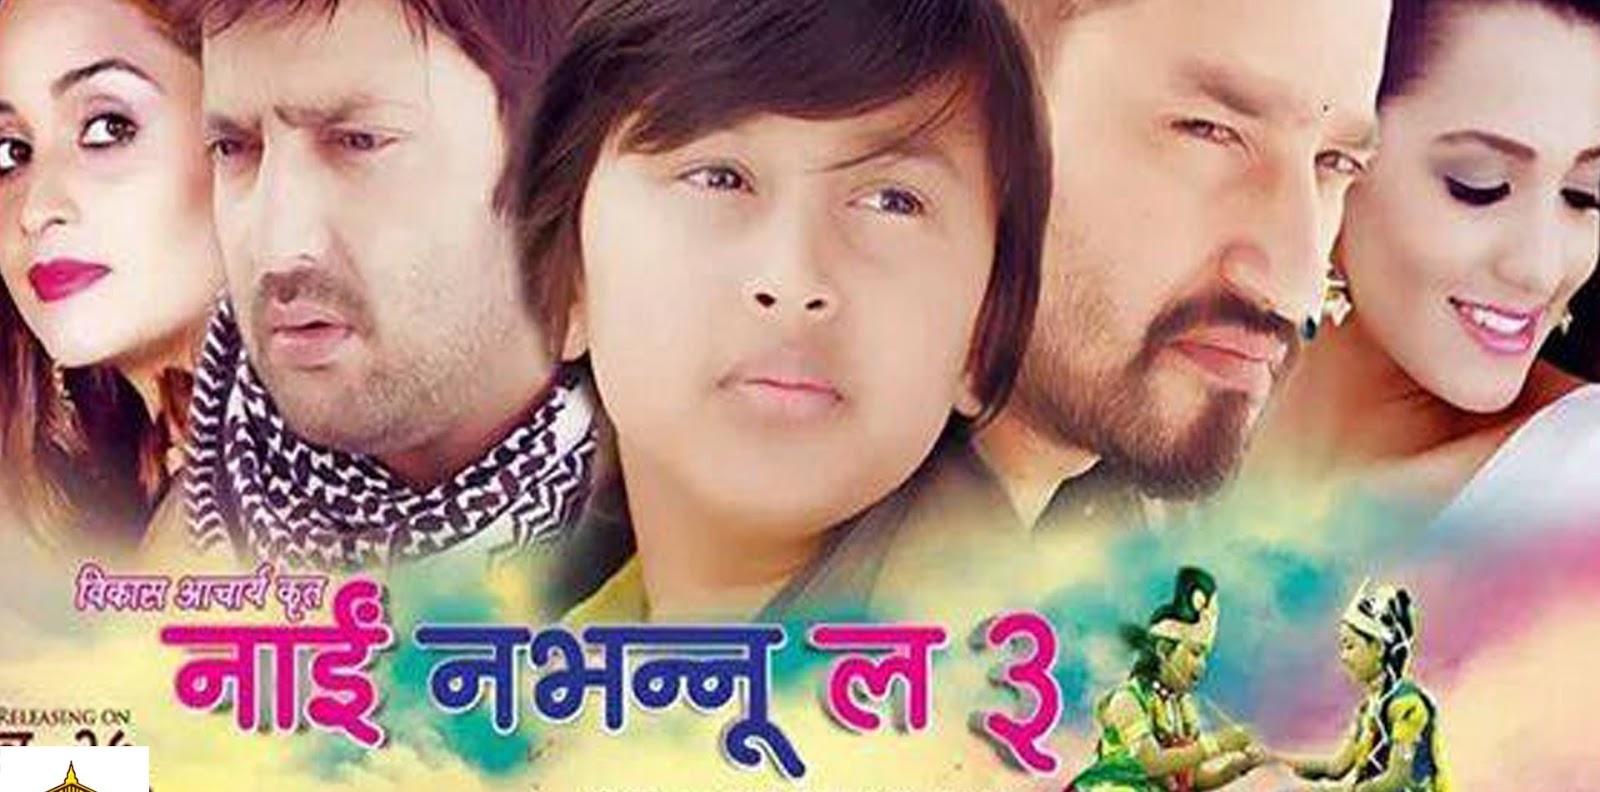 Jhandu bam (kanchhi matyang tyang) new nepali filmy geet, 2015.